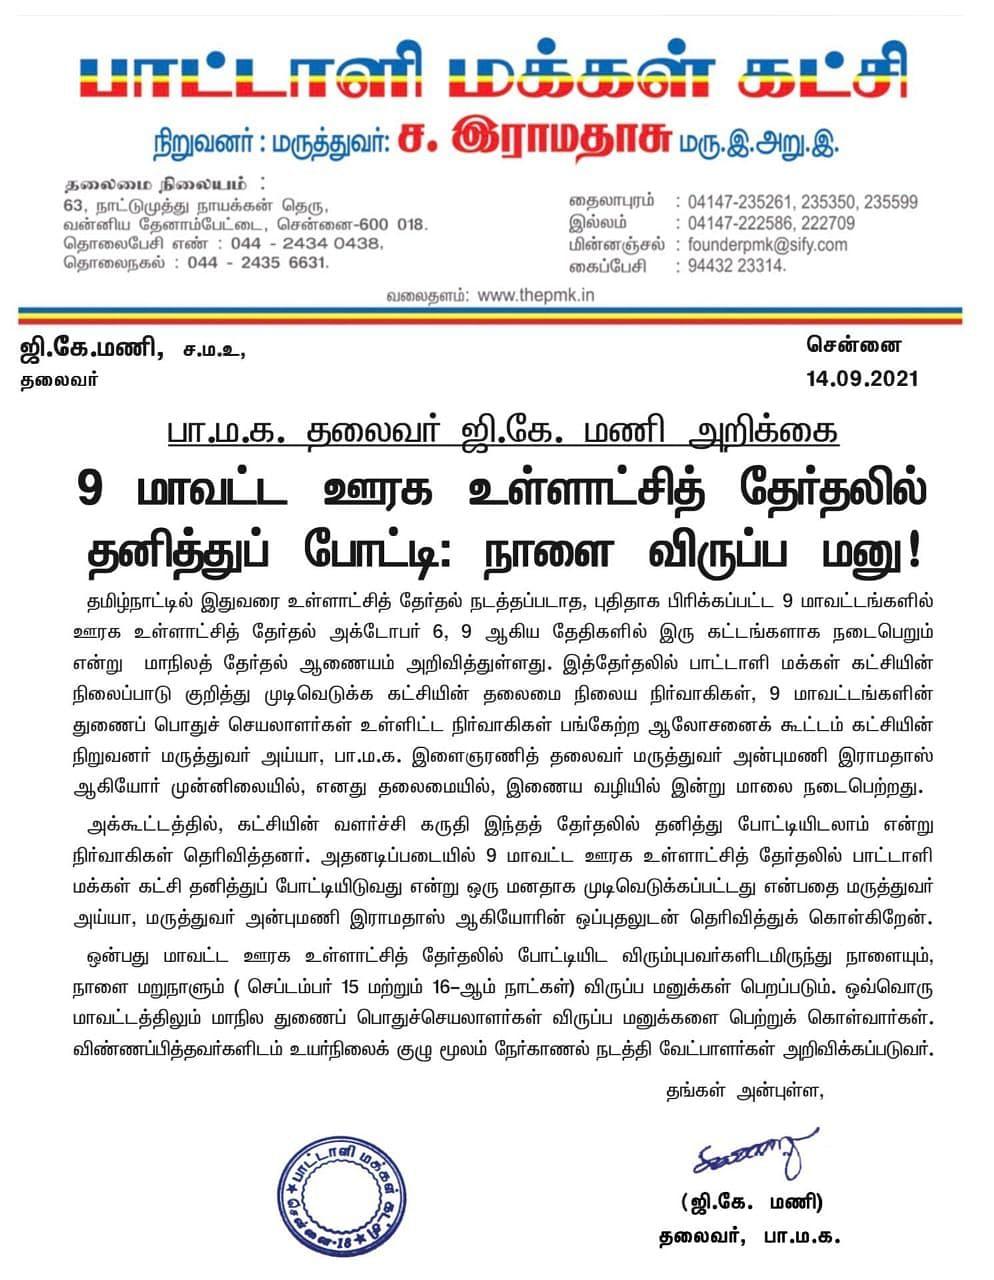 Tamil News Today: 9 மாவட்ட உள்ளாட்சித் தேர்தலில் பாமக தனித்துப் போட்டி;   அதிமுக-வுடன் கூட்டணியில்லை!